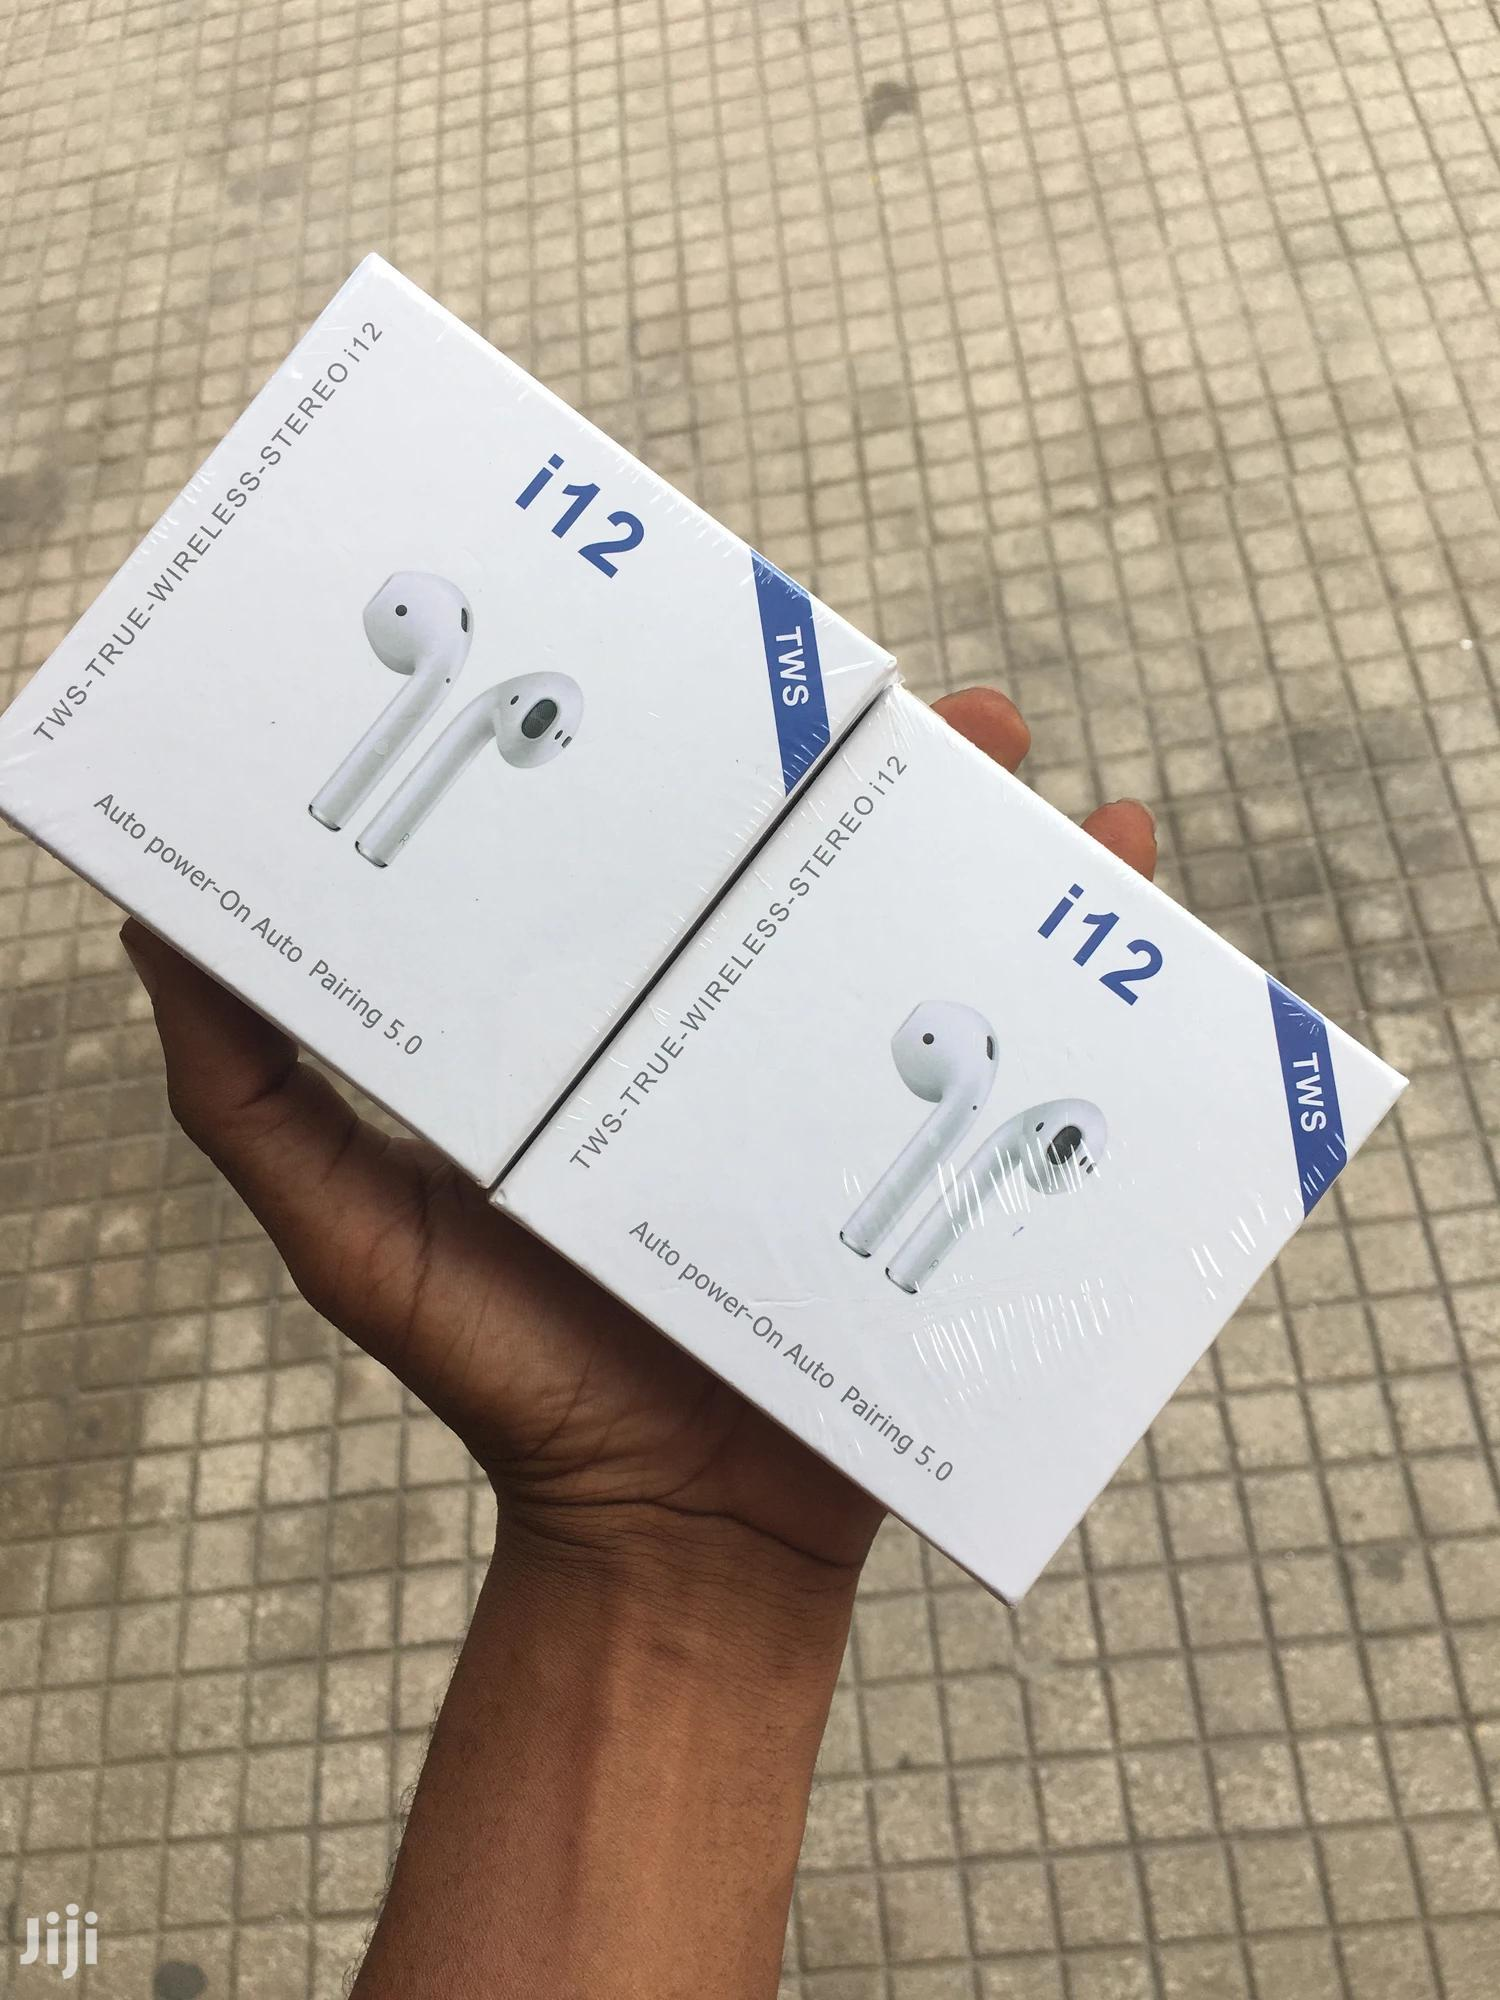 I12 Tws Airpods | Headphones for sale in Kinondoni, Dar es Salaam, Tanzania